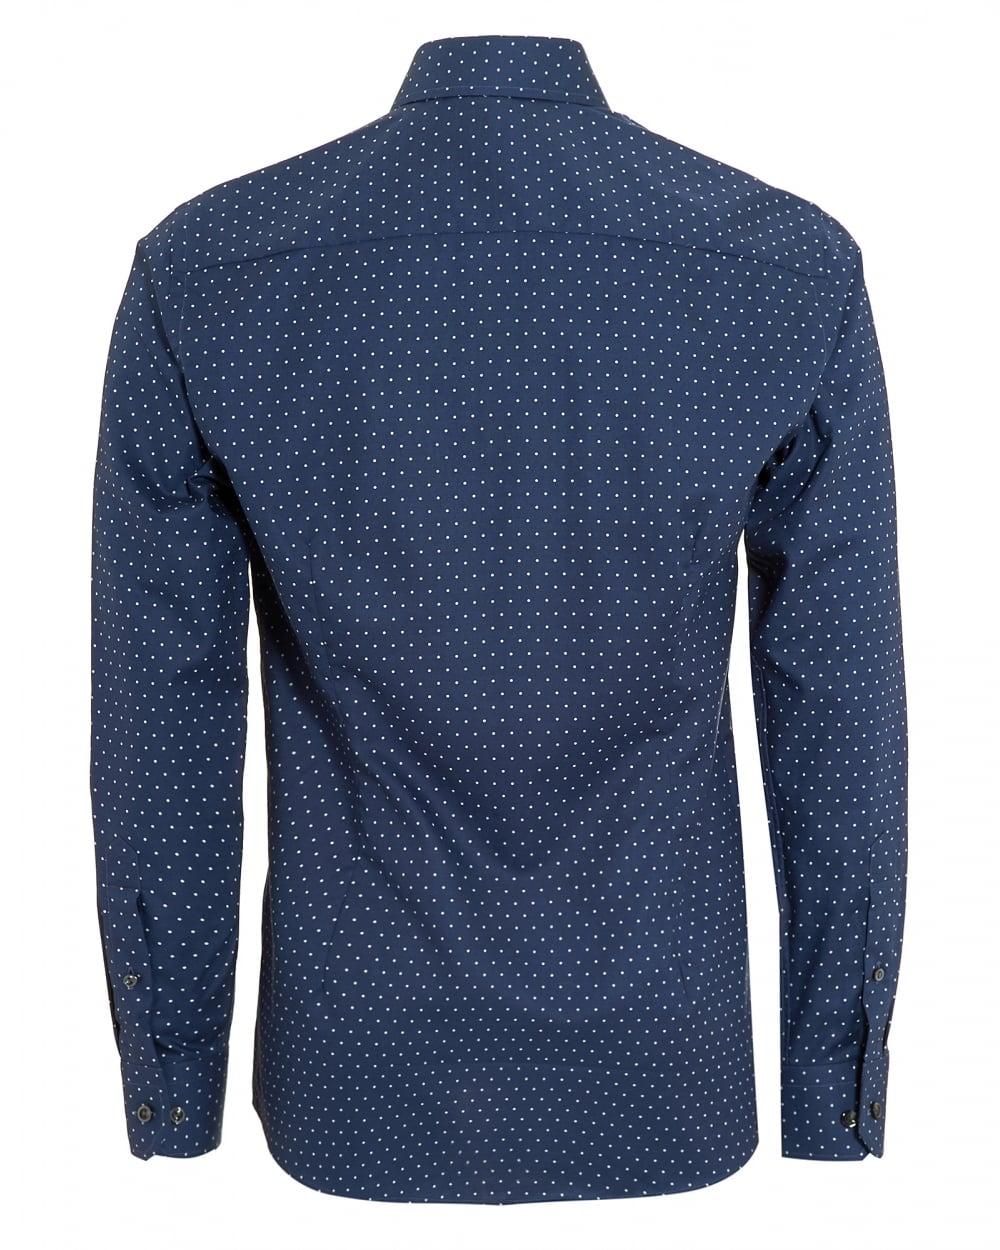 Shirt design with collar - Mens Slim Fit Polka Dot Cotton Navy Blue Shirt